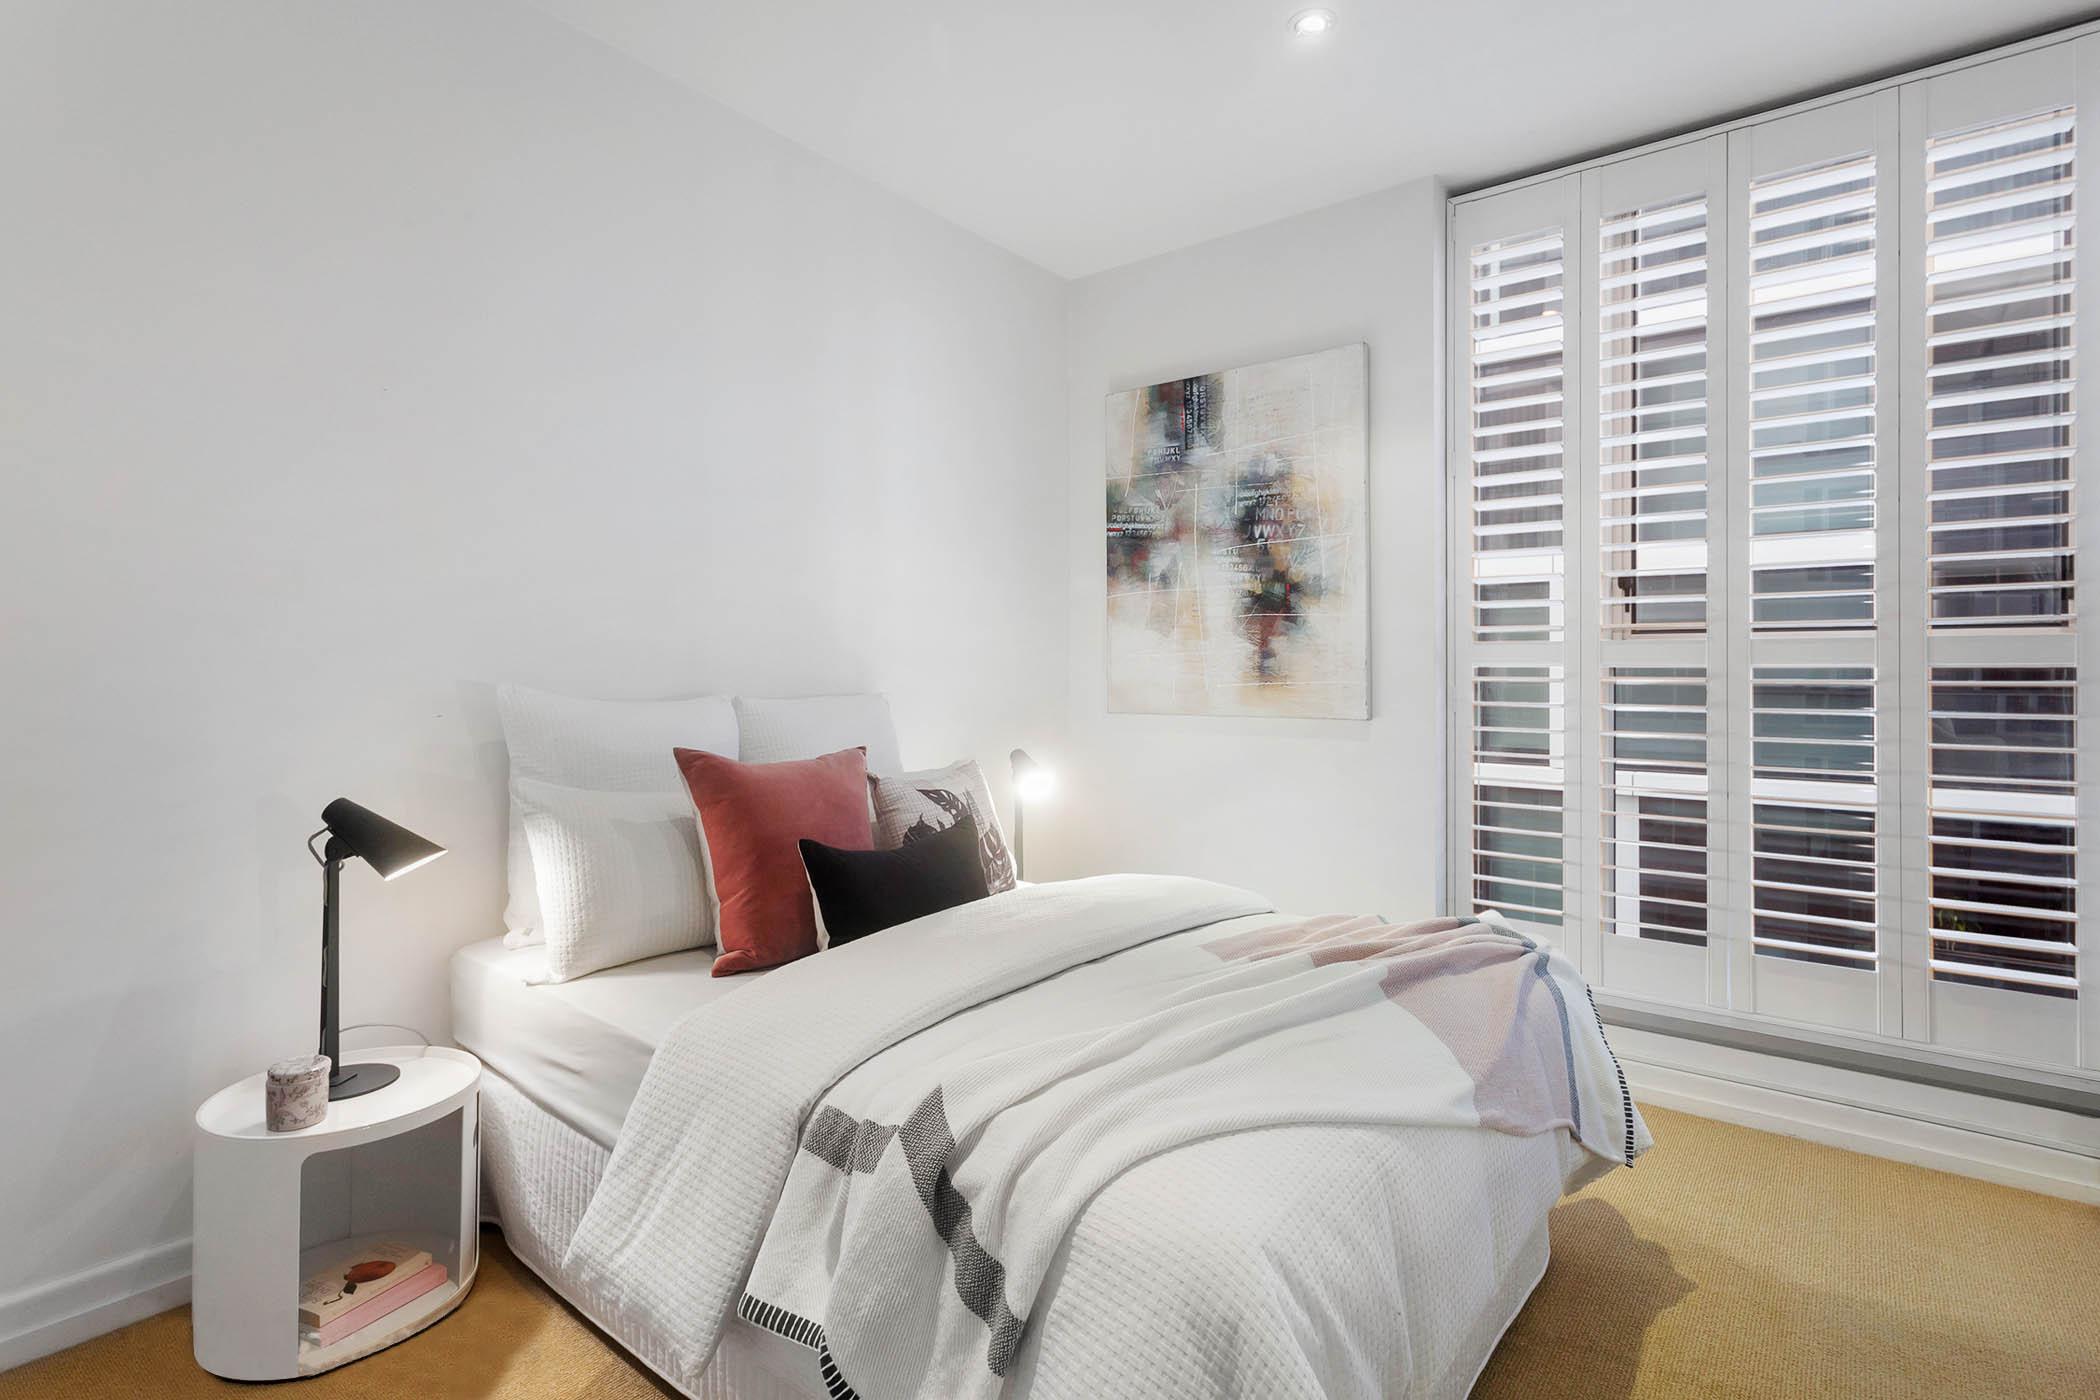 1804-31-spring-street-melbourne-student-accommodation-Melbourne-Bedroom-Unilodgers